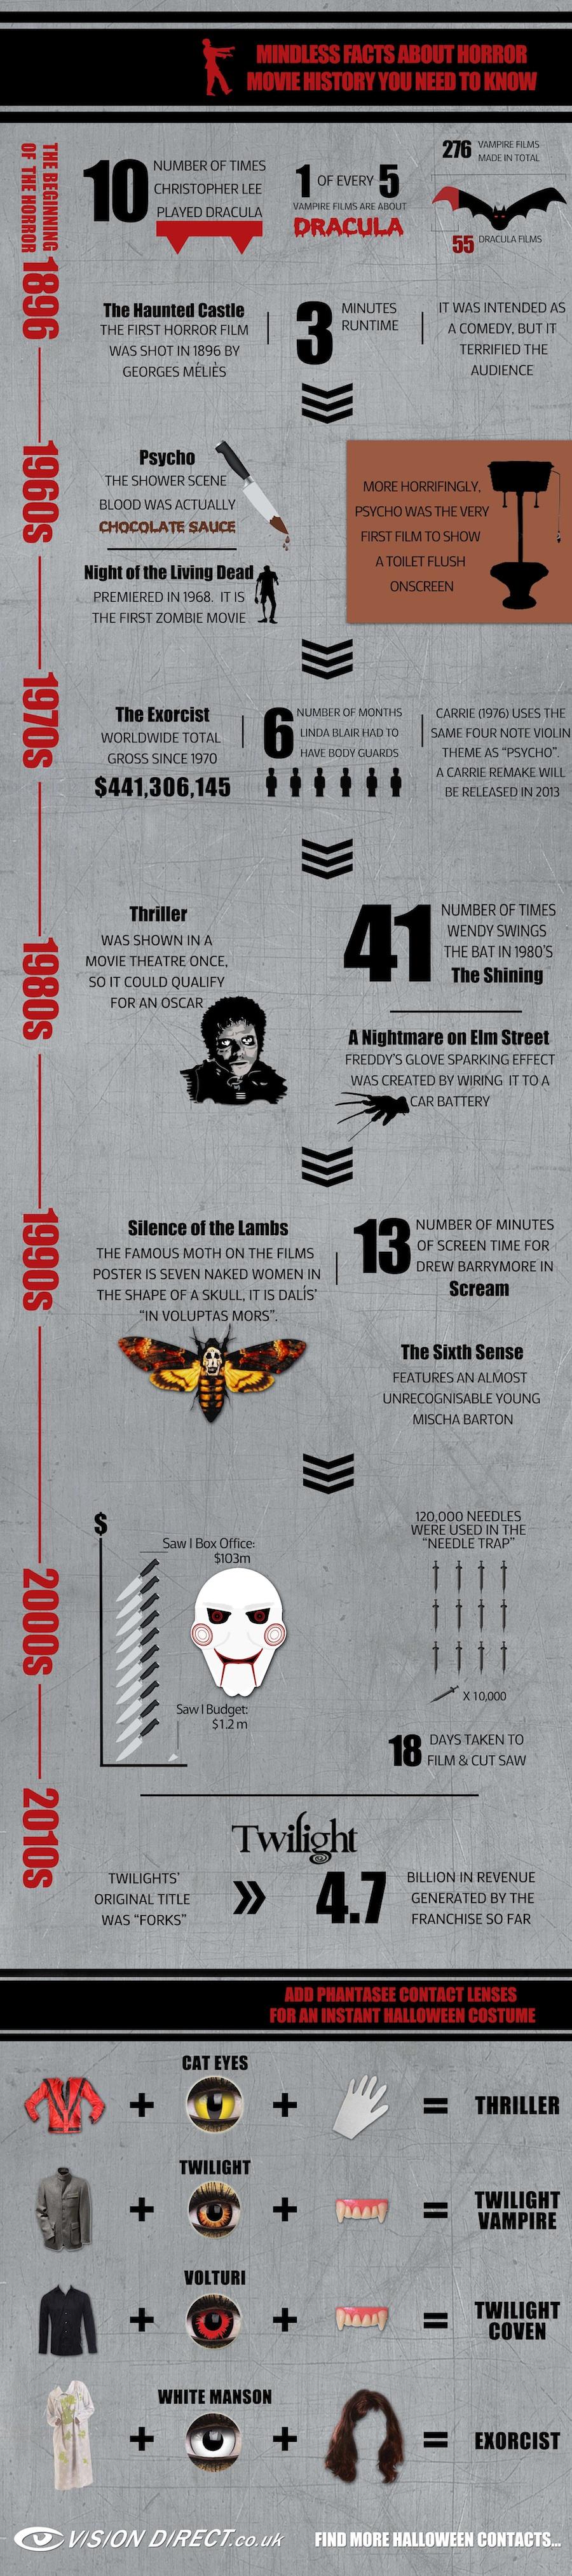 brainless halloween horror movie facts - Halloween Horror Movie Trivia